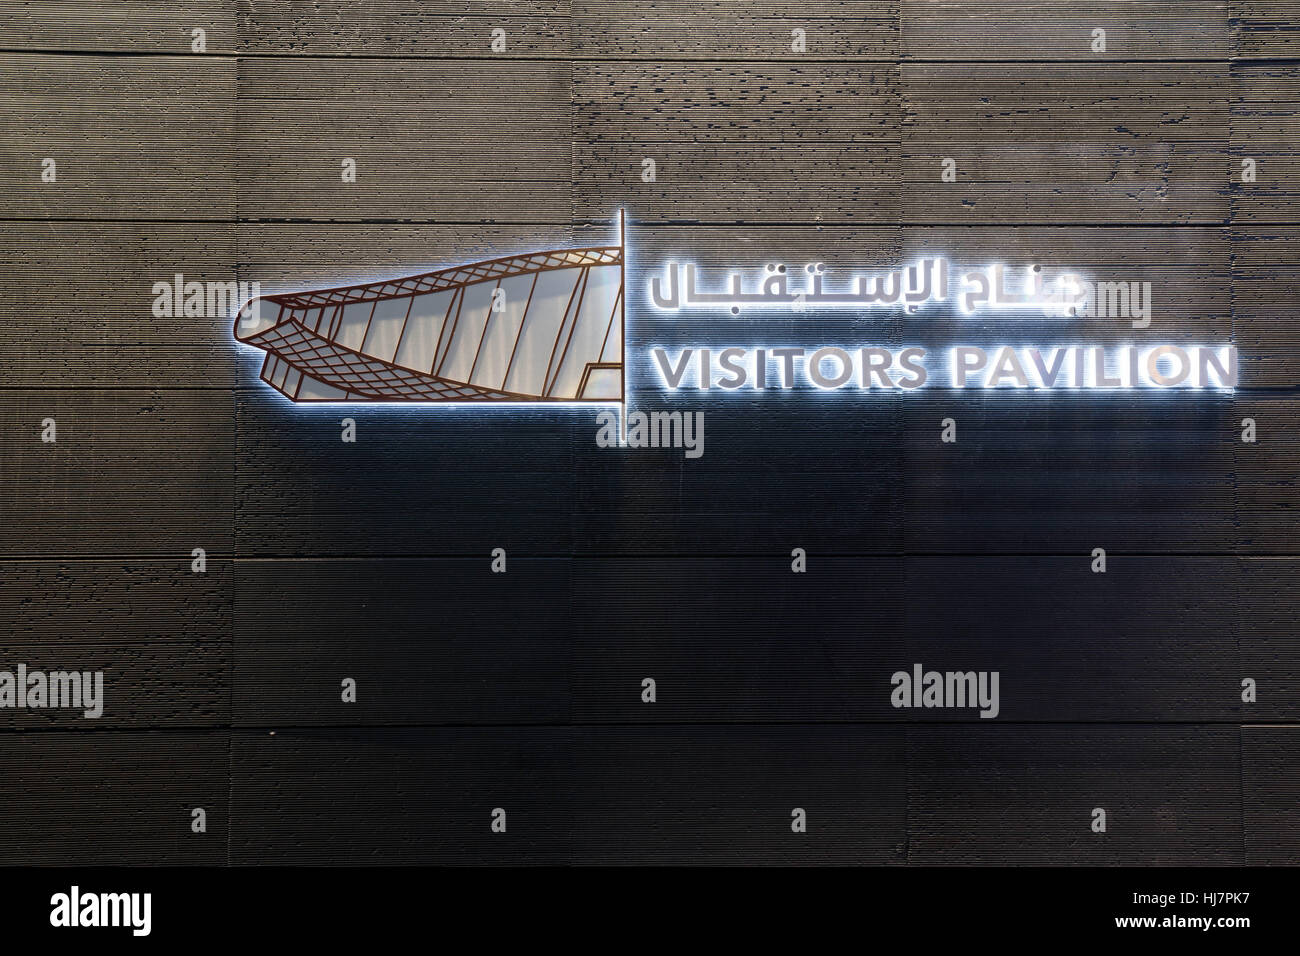 Etihad museum entrance sign visitors pavilion - Stock Image